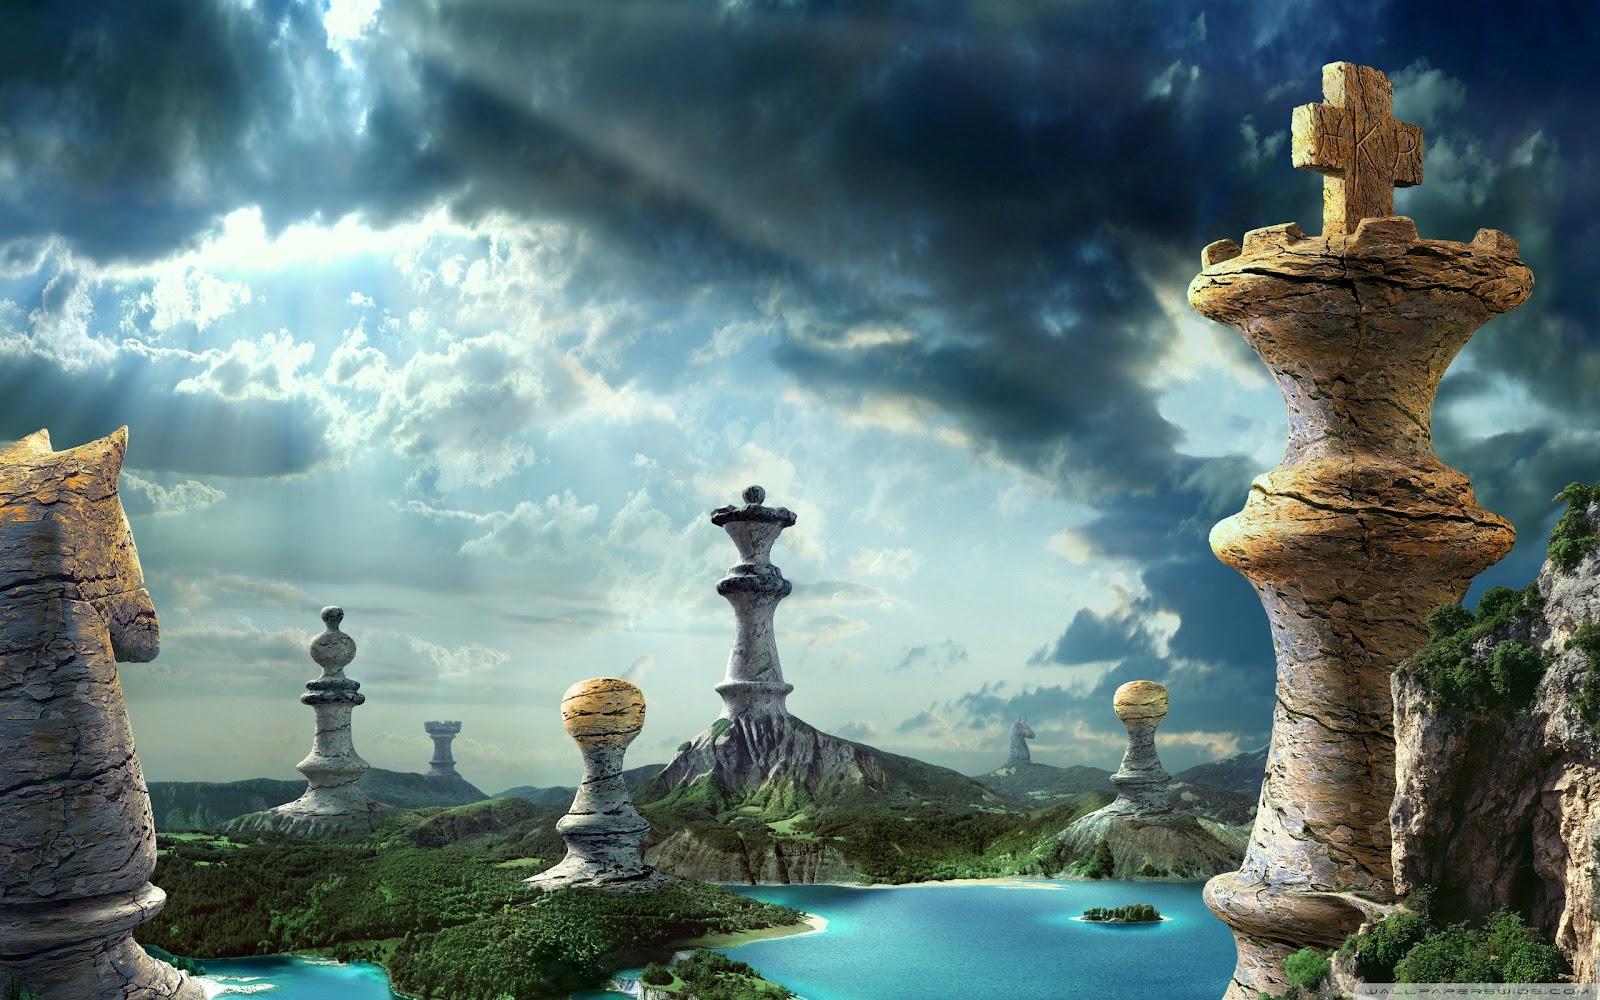 http://2.bp.blogspot.com/-PjzteMMMTY0/T7FmdpA5bOI/AAAAAAAAAY4/-L7SsawNZC0/s1600/fantasy_chess_art-wallpaper-2560x1600.jpg